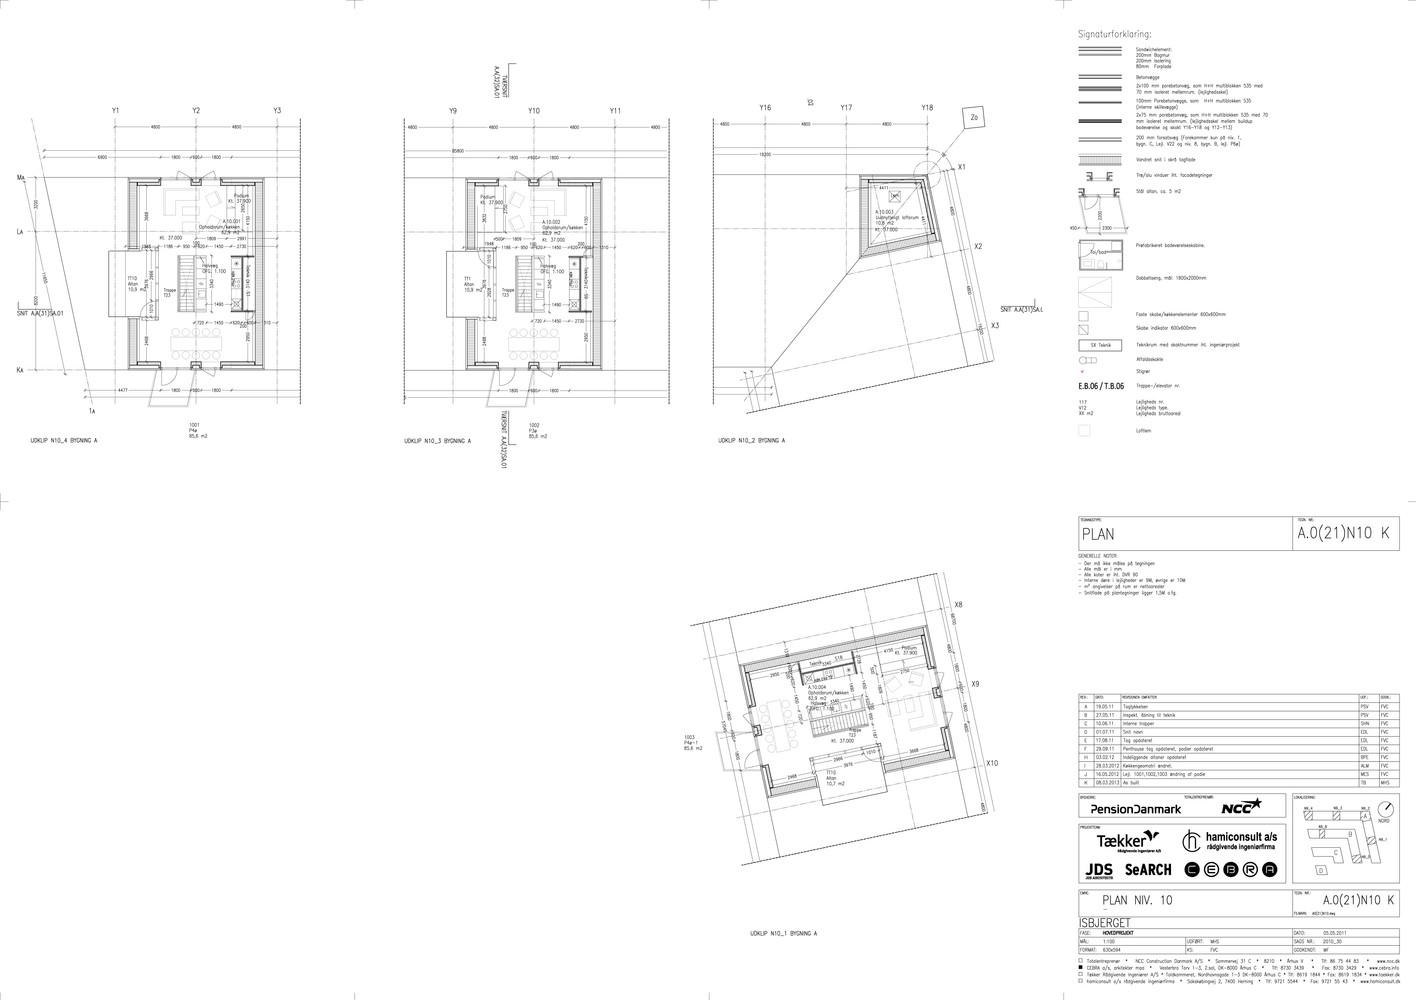 medium resolution of the iceberg search cebra jds louis paillard architects tenth floor plan